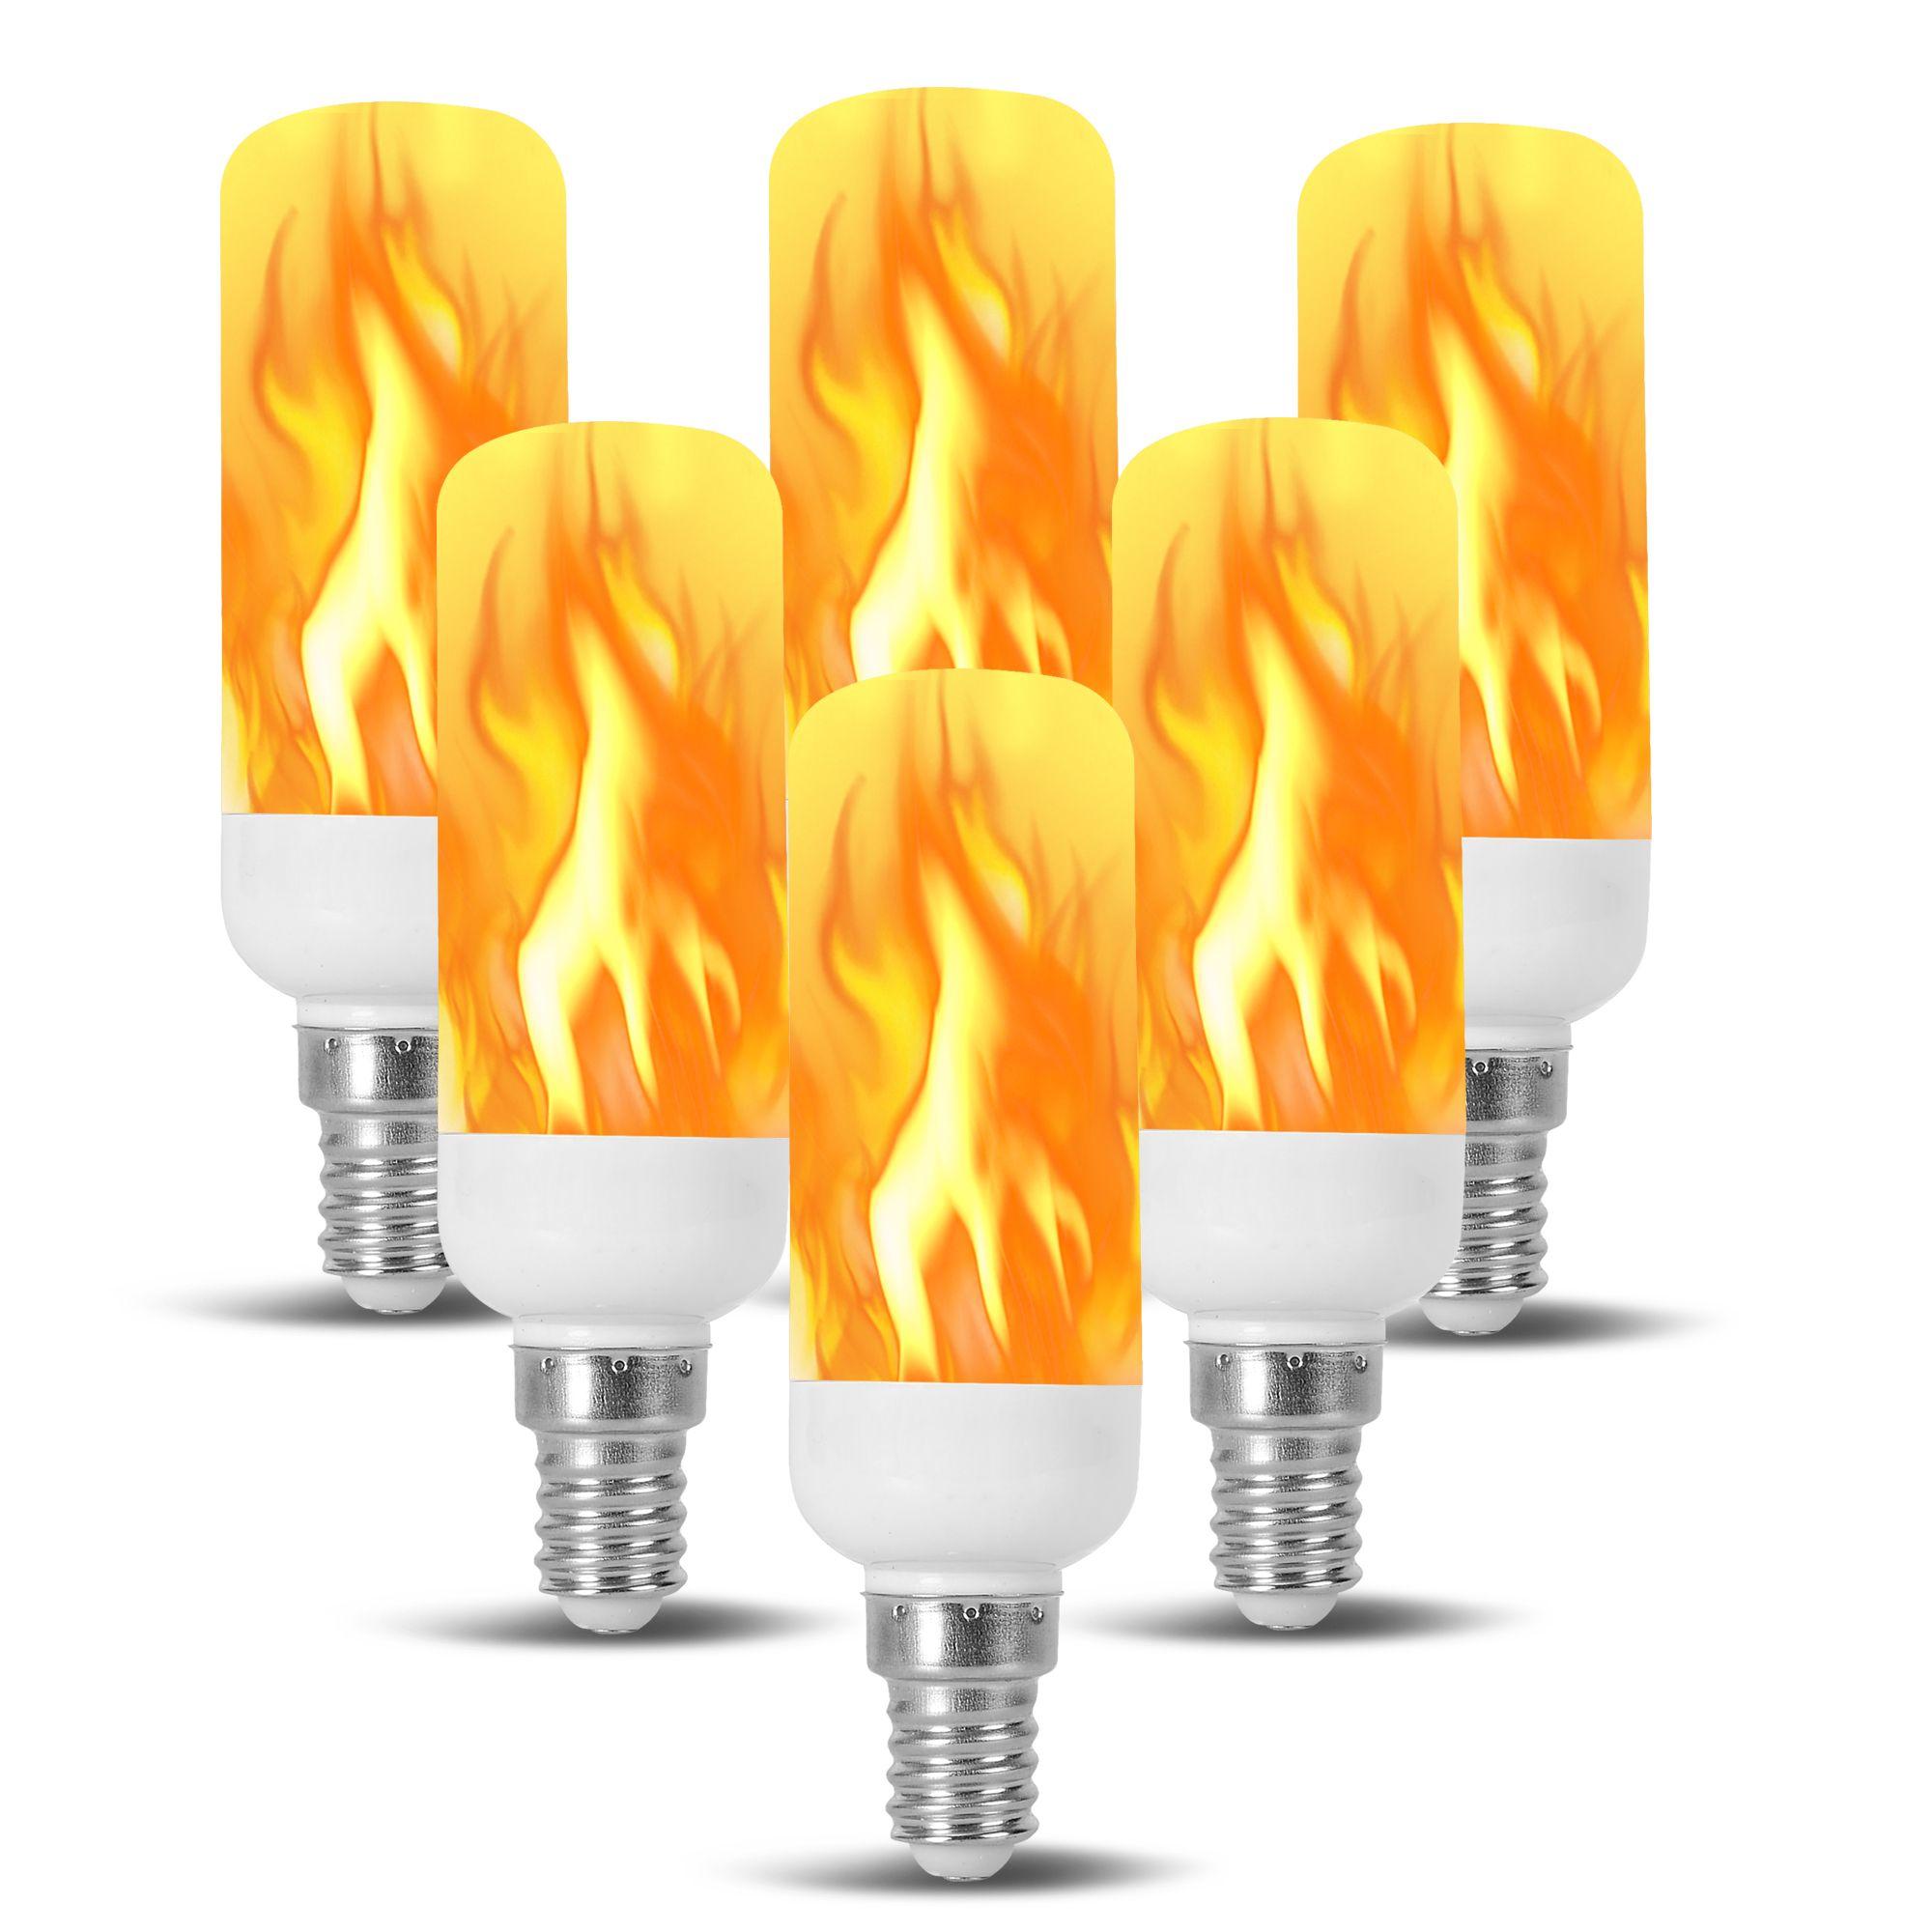 Flame Jdd Tubular Shape Led Fire Candle Light Bulb Flaming Flicker E12 E14 Light Bulb Candle Fire Candle Bulb